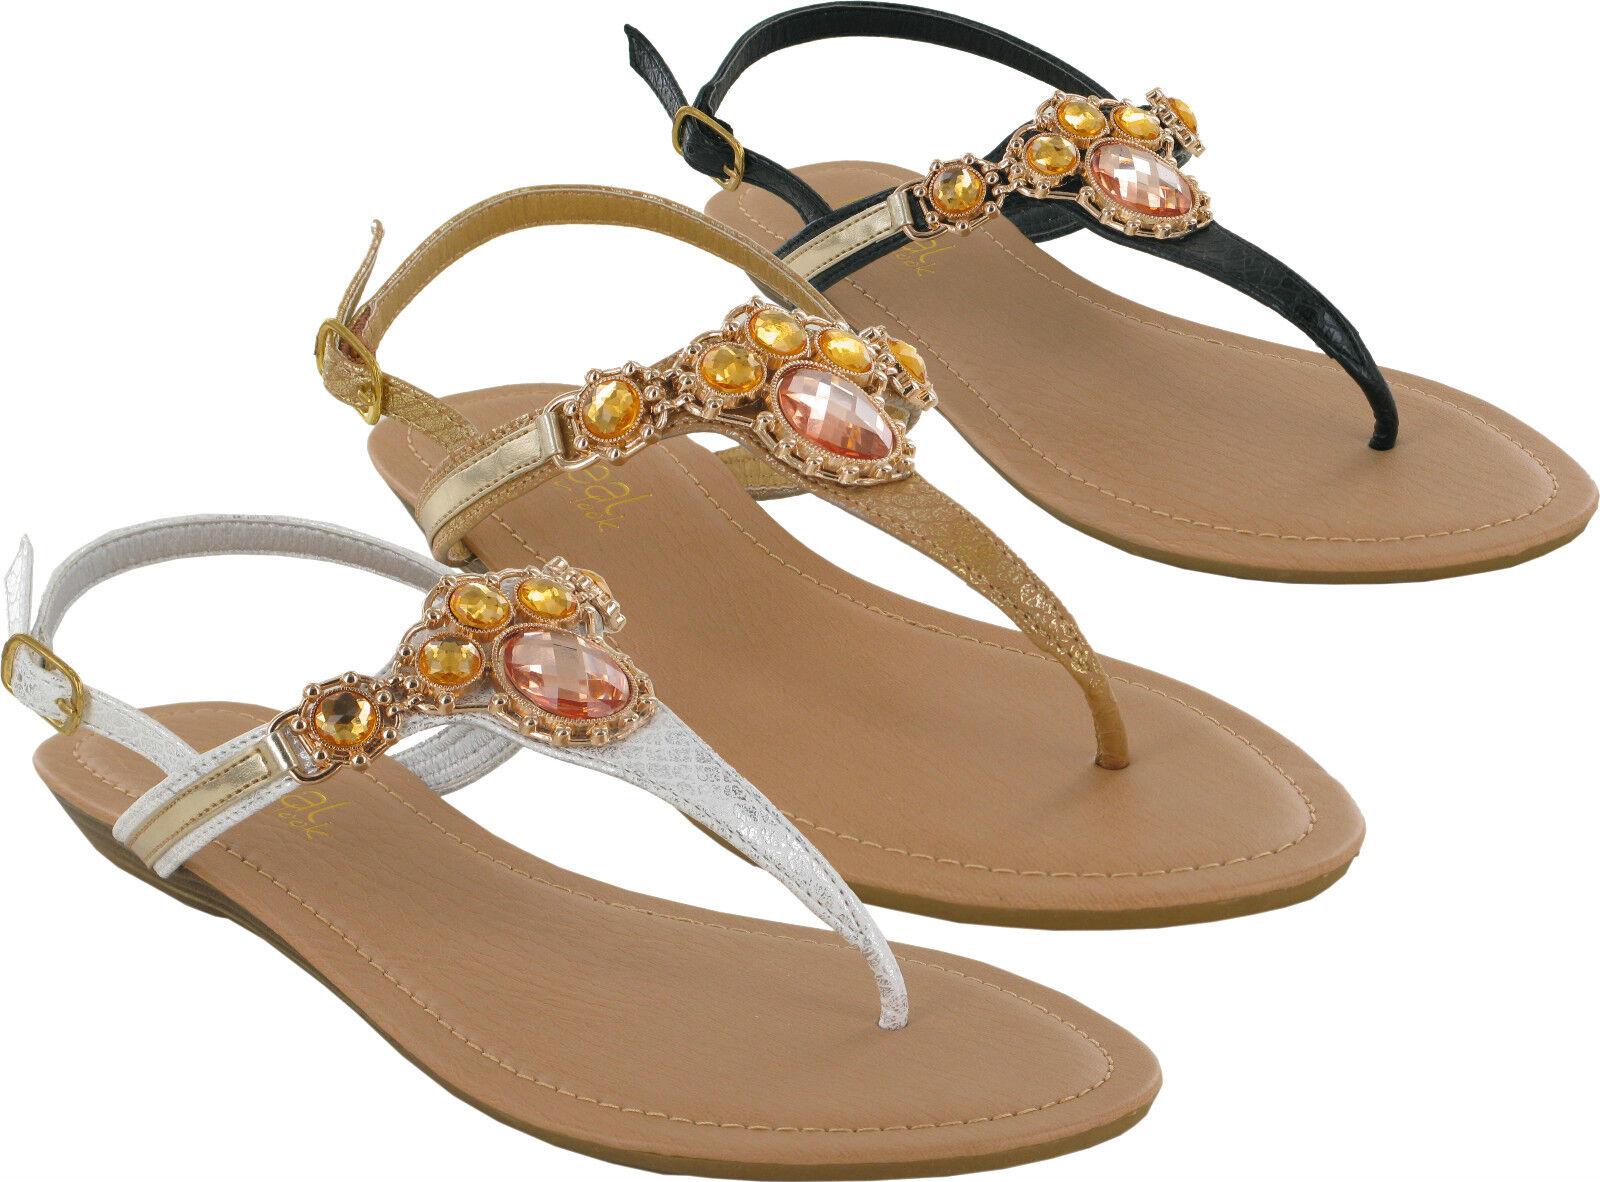 LADIES BACK BUCKLE DIAMOND FLAT MULE SUMMER 3-8 BEACH SANDALS UK SIZES 3-8 SUMMER 6b3d51